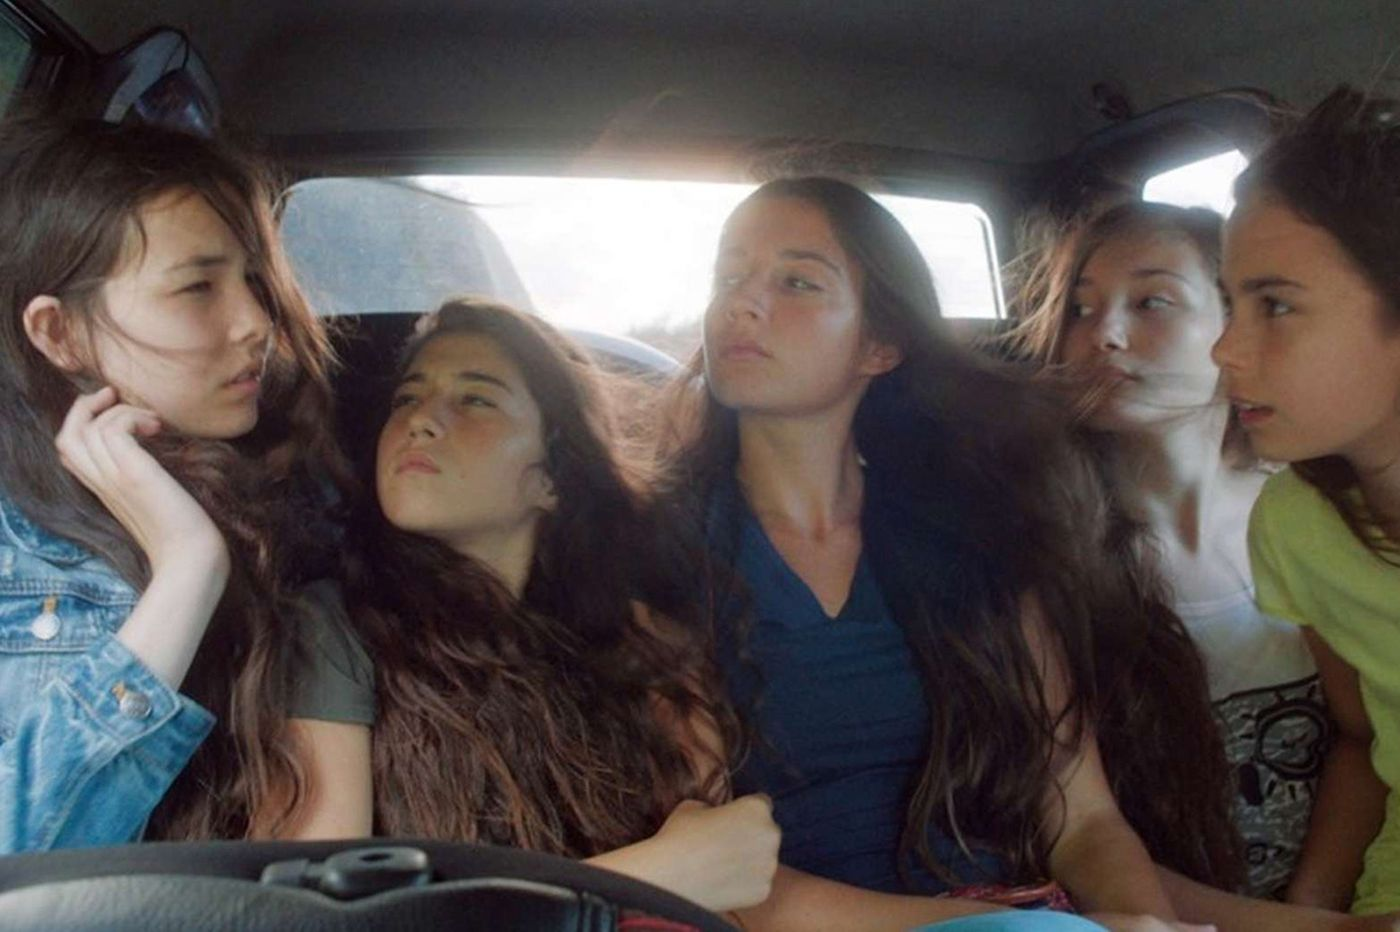 'Mustang': Lovely sisters, brutal truths